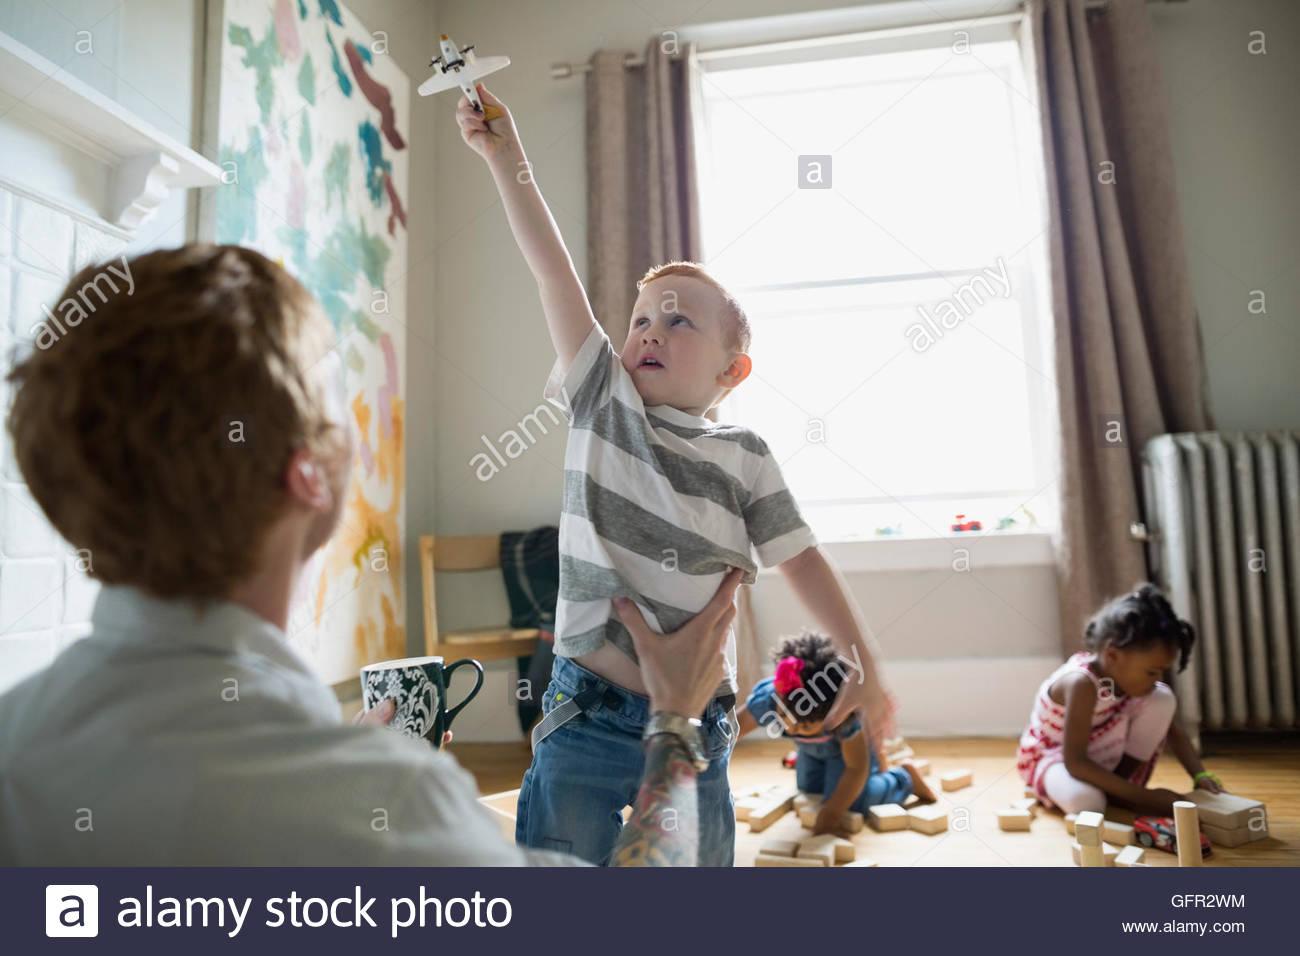 Vater beobachtete Sohn Spielzeugflugzeug fliegen Stockbild